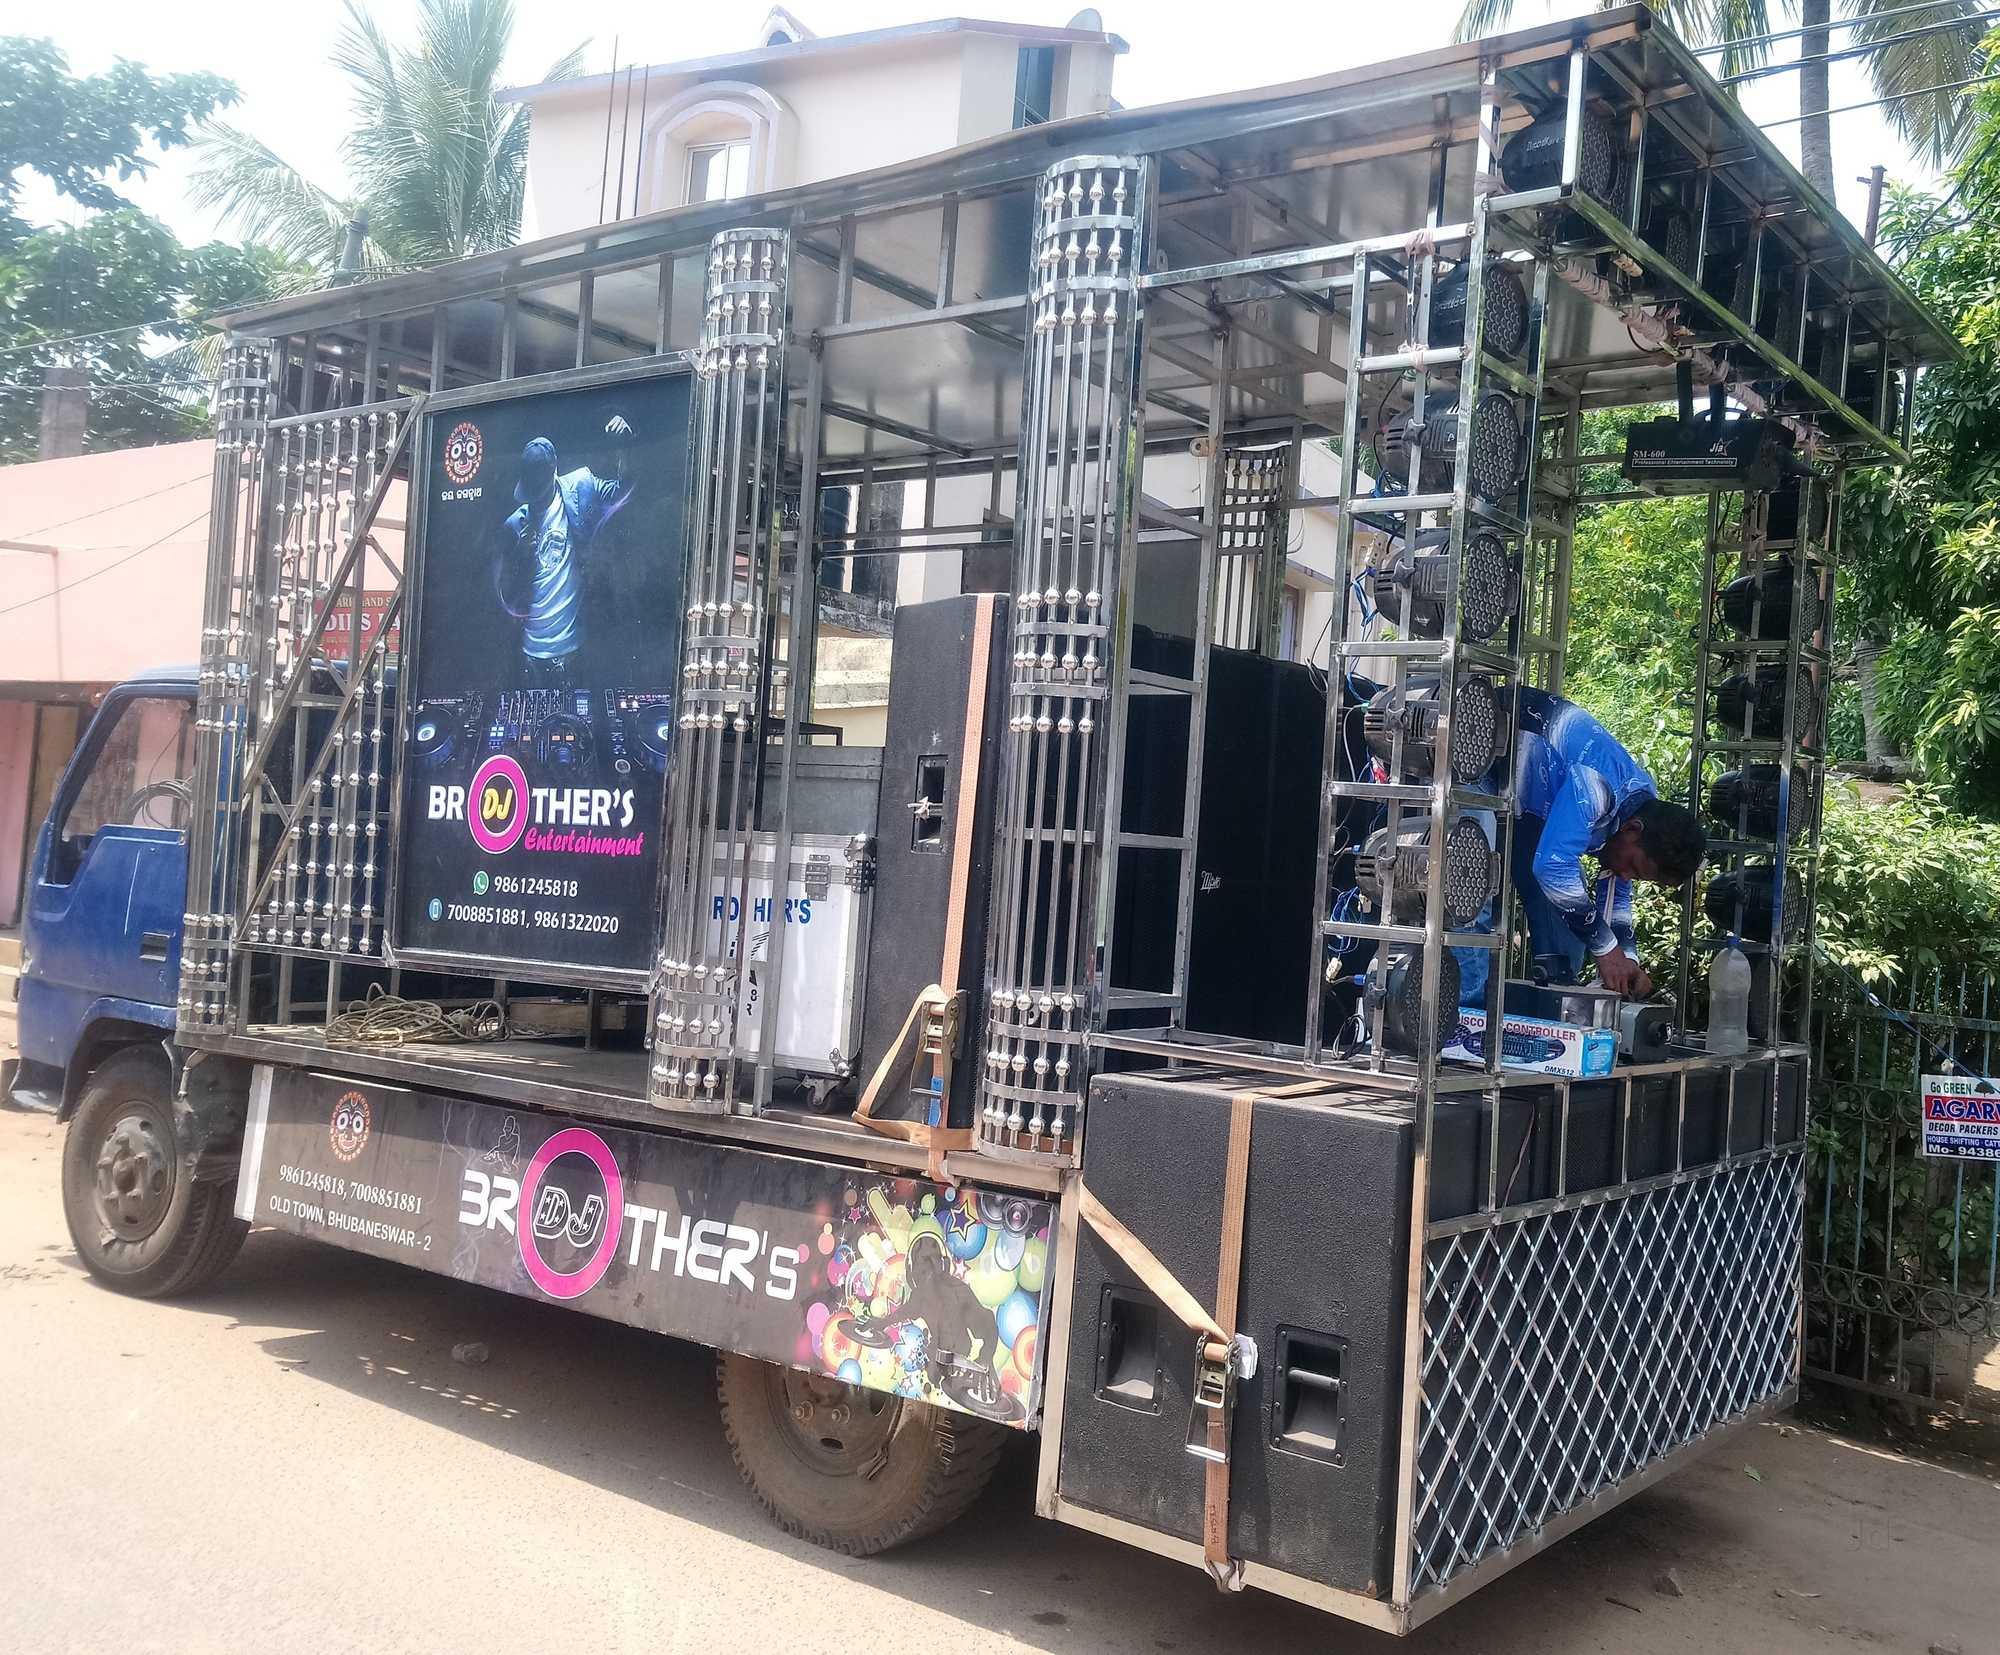 Top 30 DJ Services in Kalyani Market, Bhubaneshwar - Best